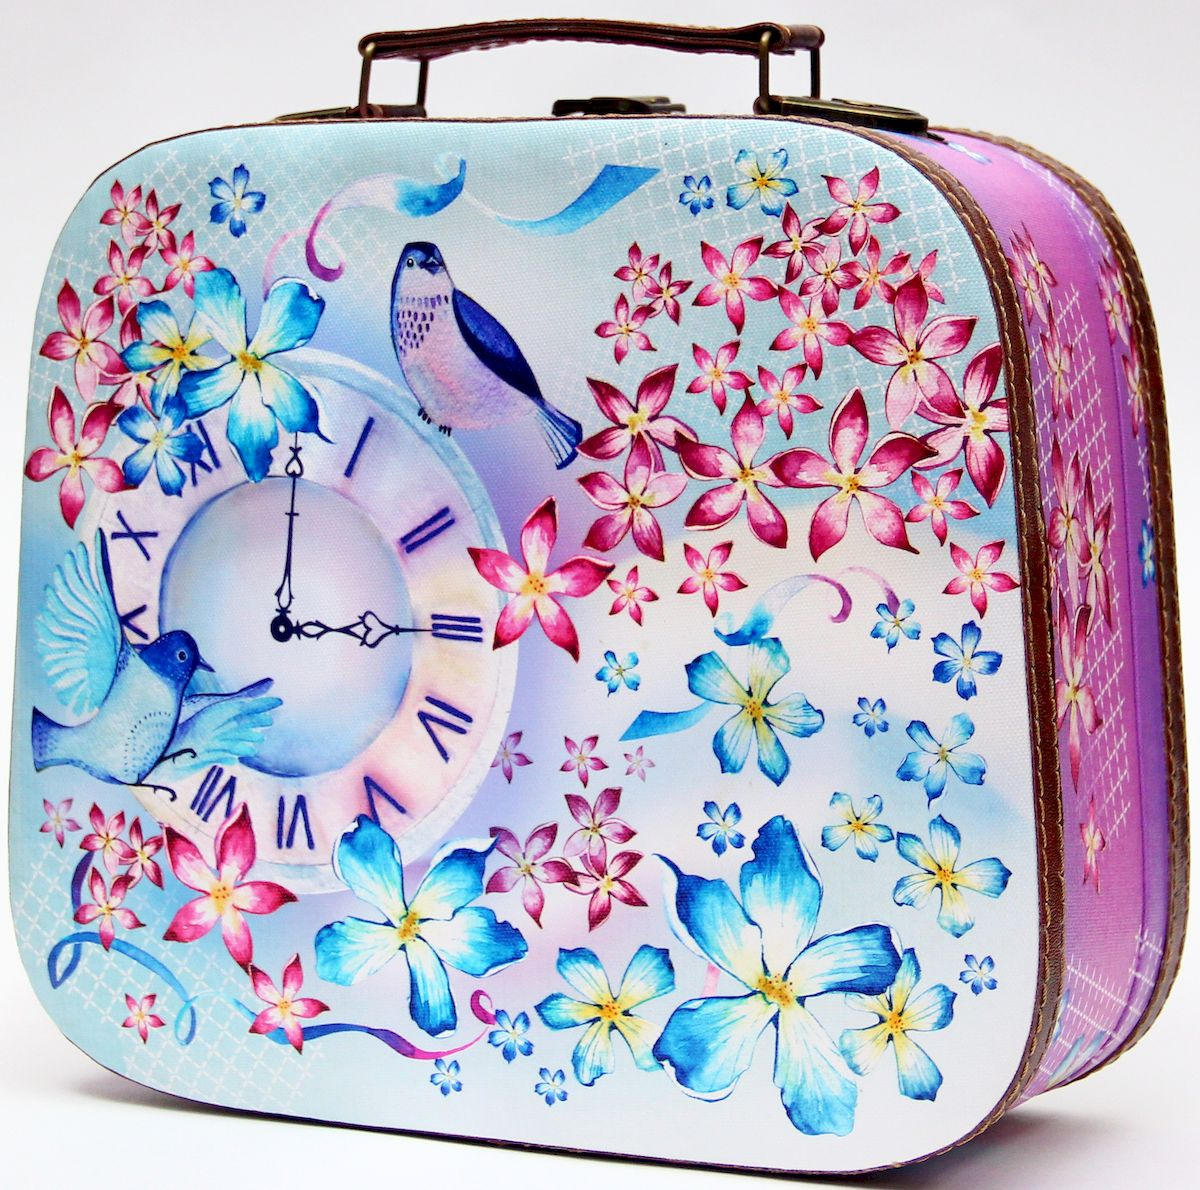 Шкатулка декоративная Magic Home Часы и птичка, цвет: розовый, 28,5 х 25 х 10,5 см шкатулки magic home шкатулка дождь в париже